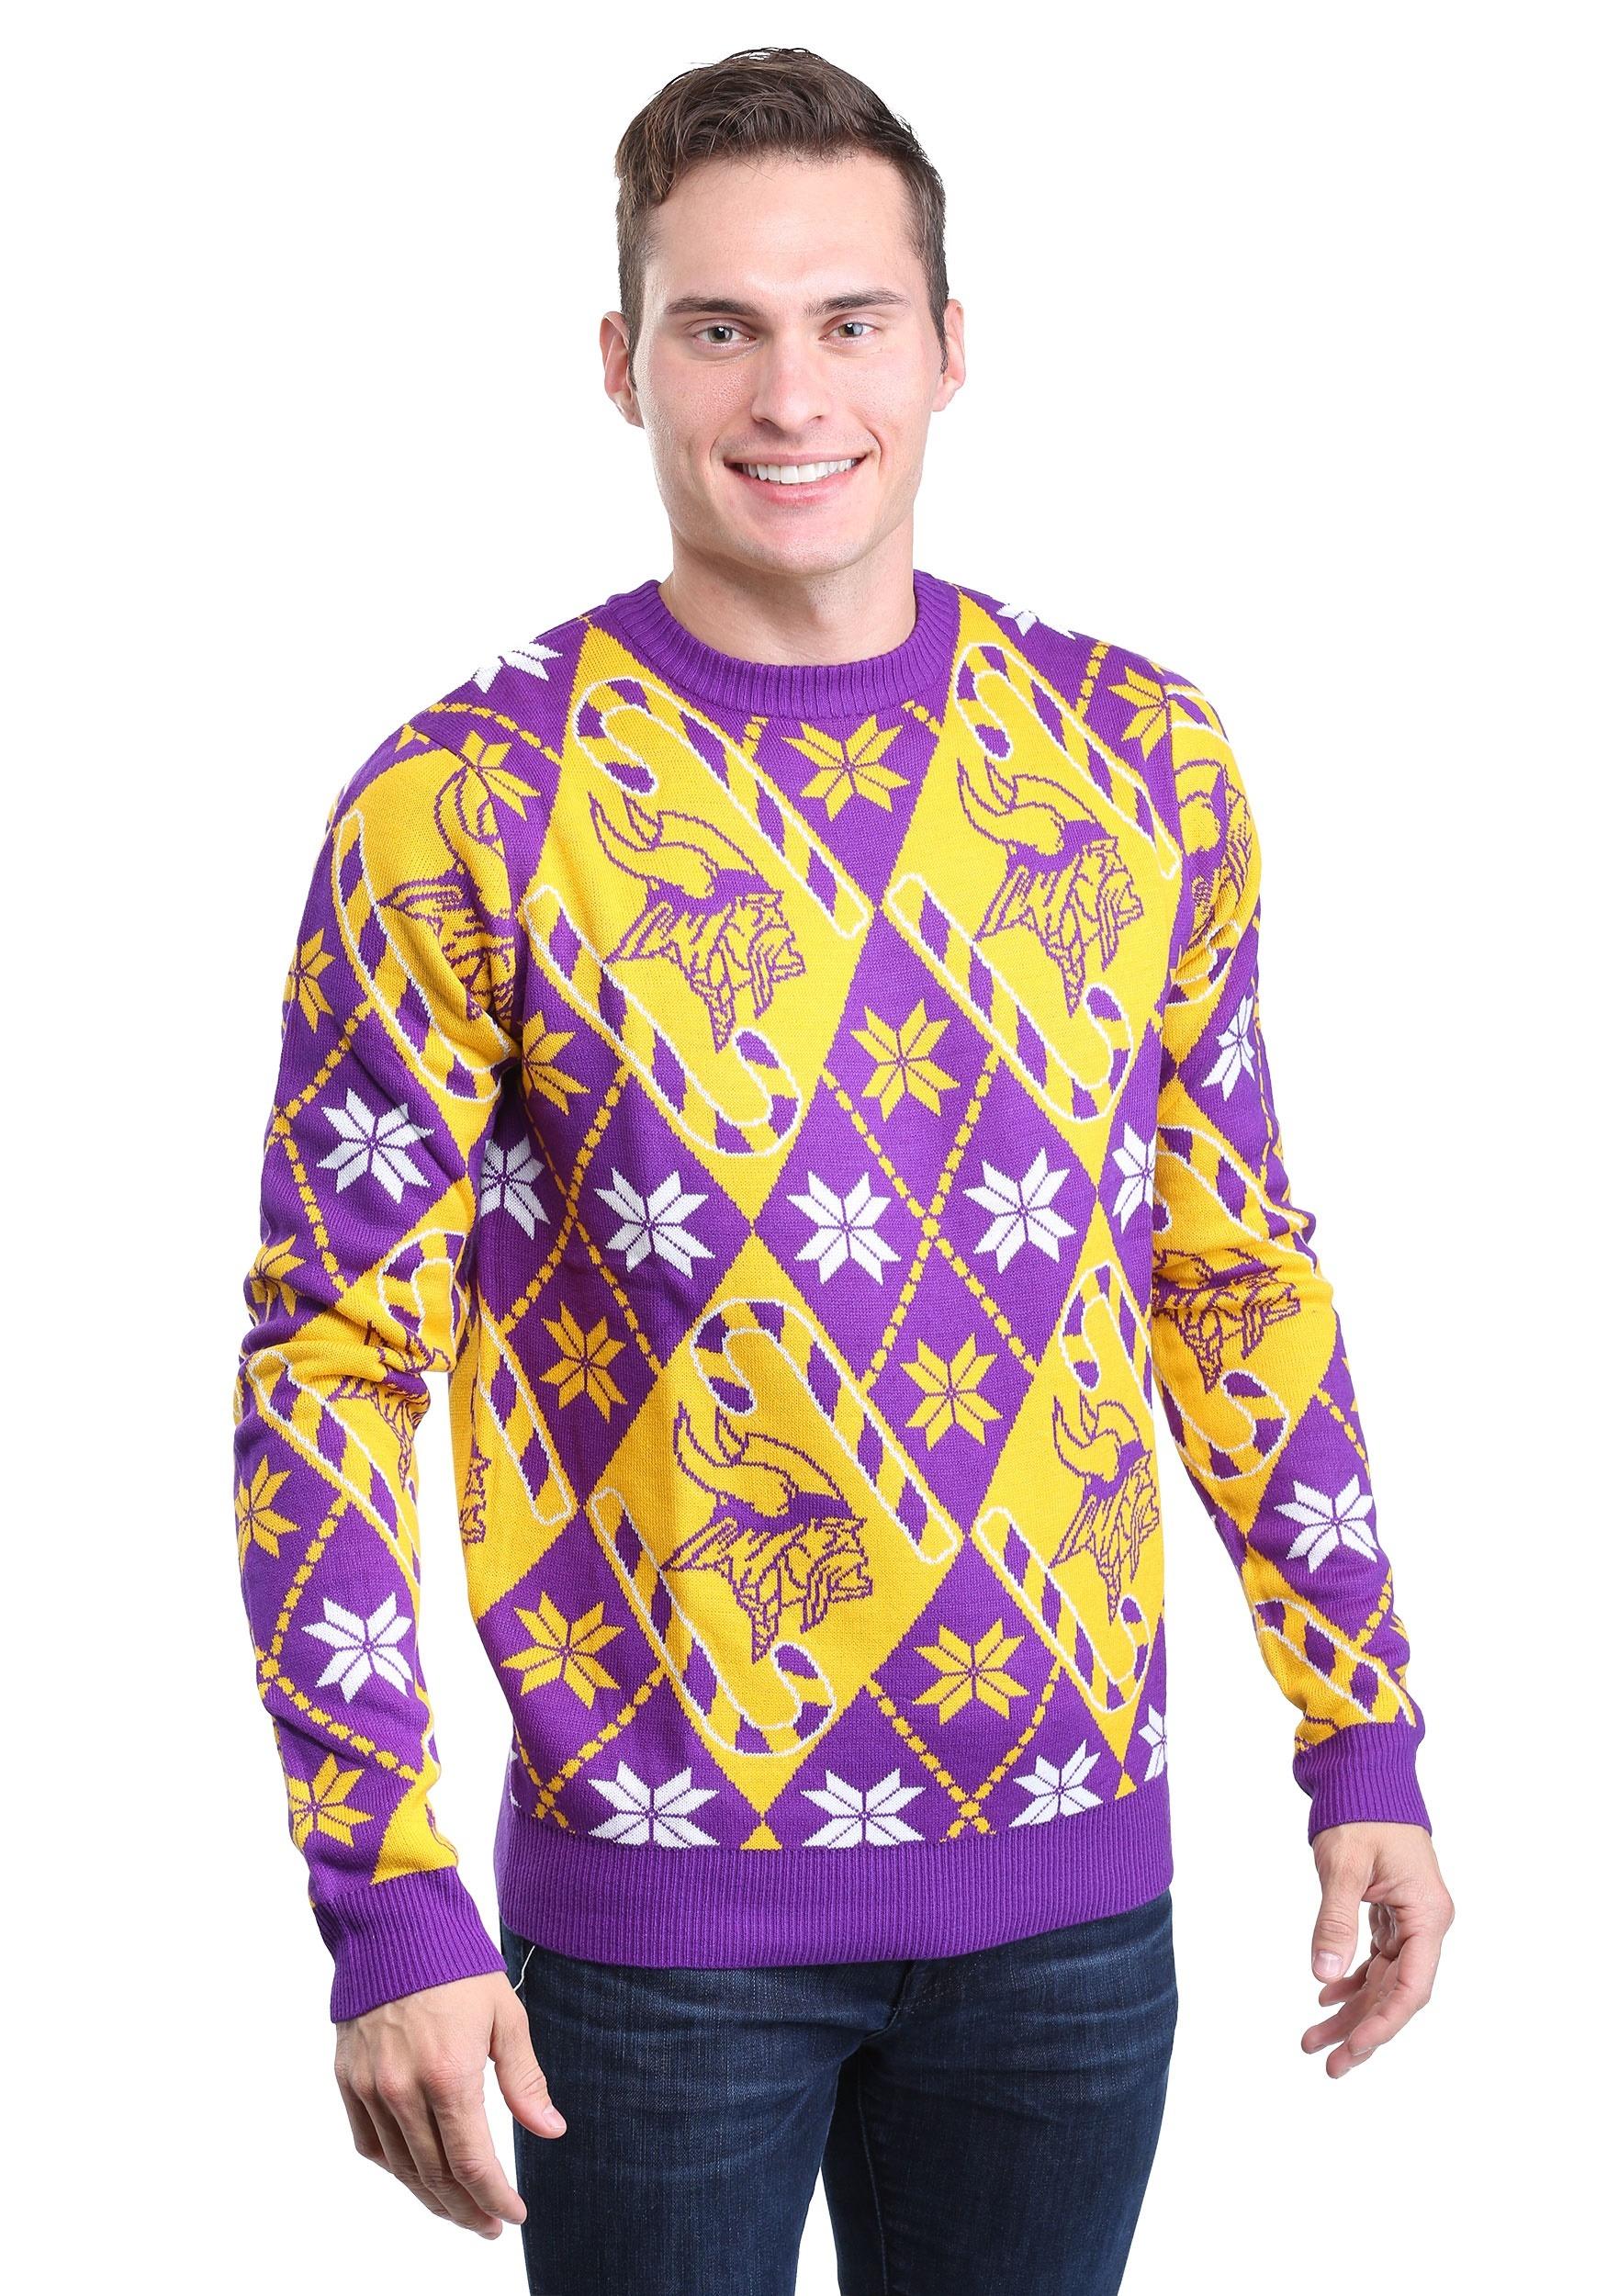 Sexy minnesota vikings apparel